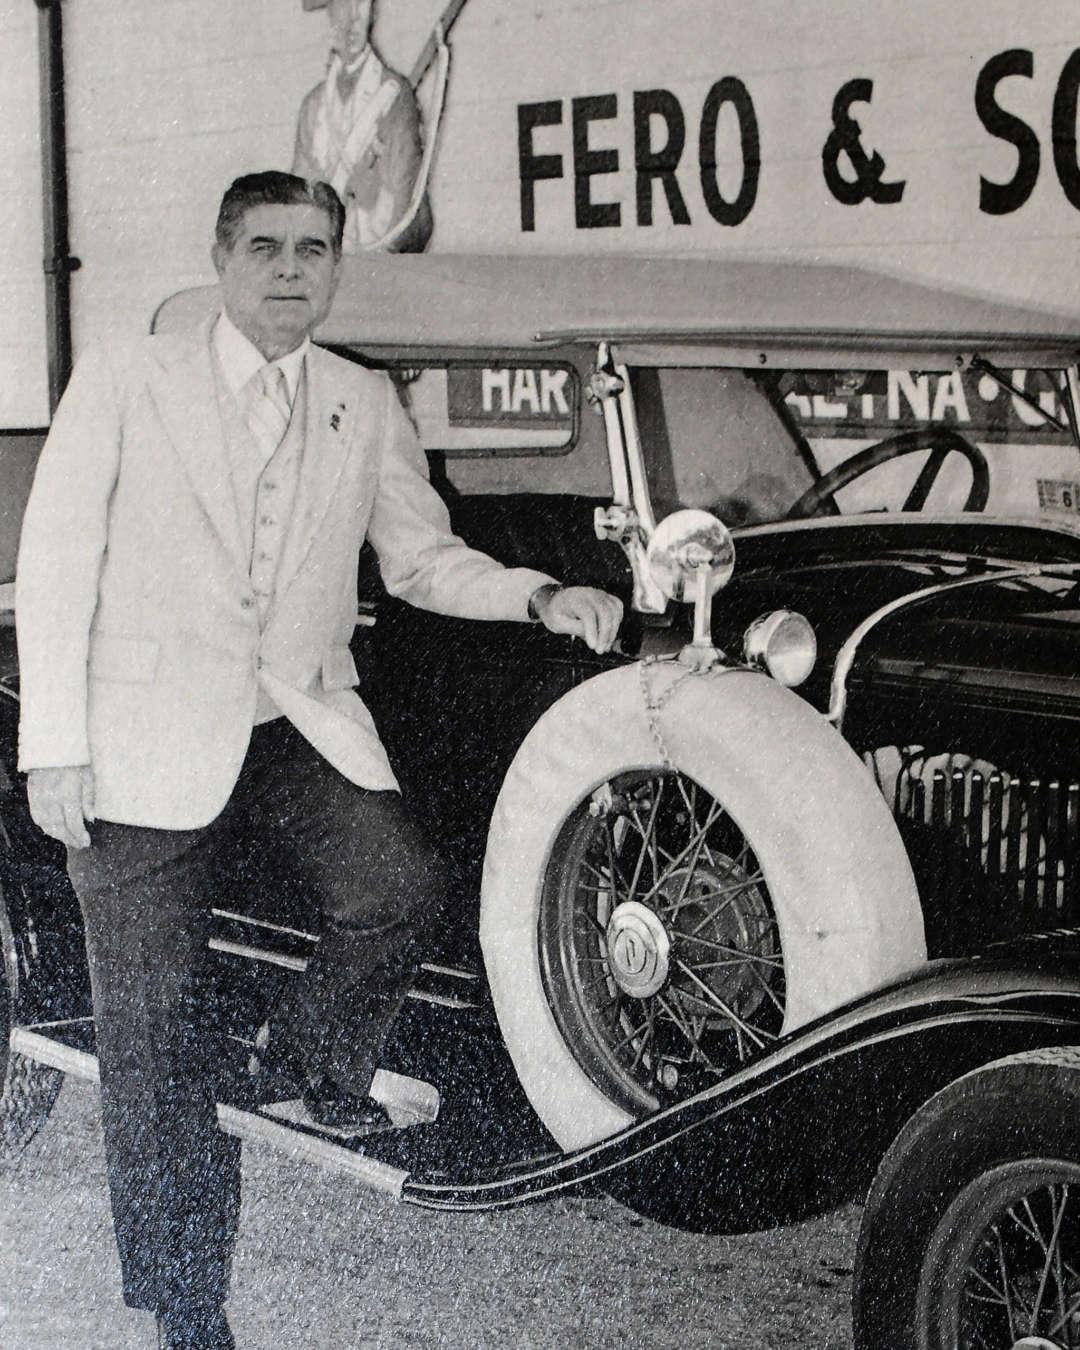 Black and white image of original Mr. Fero who opened Fero Insurance